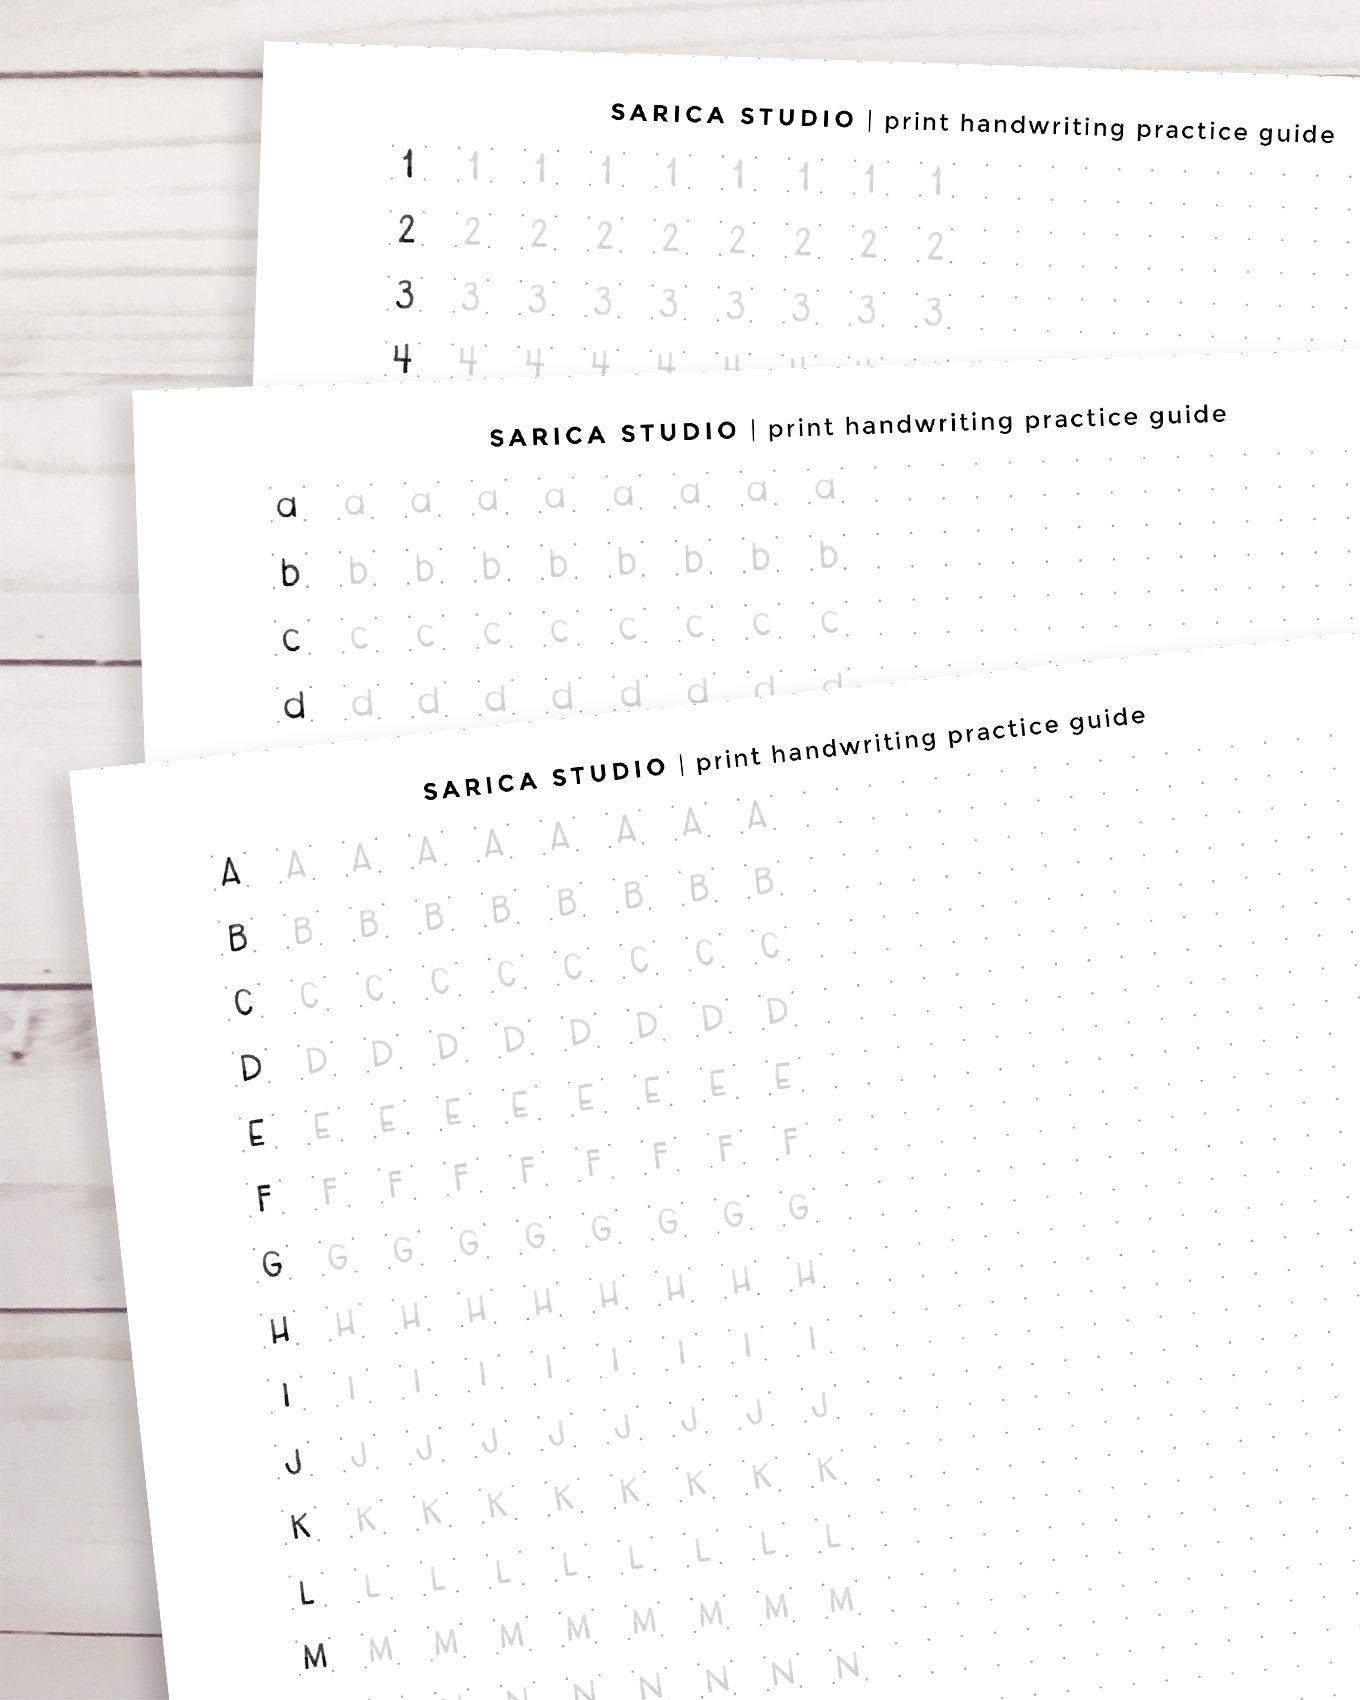 medium resolution of Adult Handwriting Worksheets Free Printable   Printable Worksheets and  Activities for Teachers